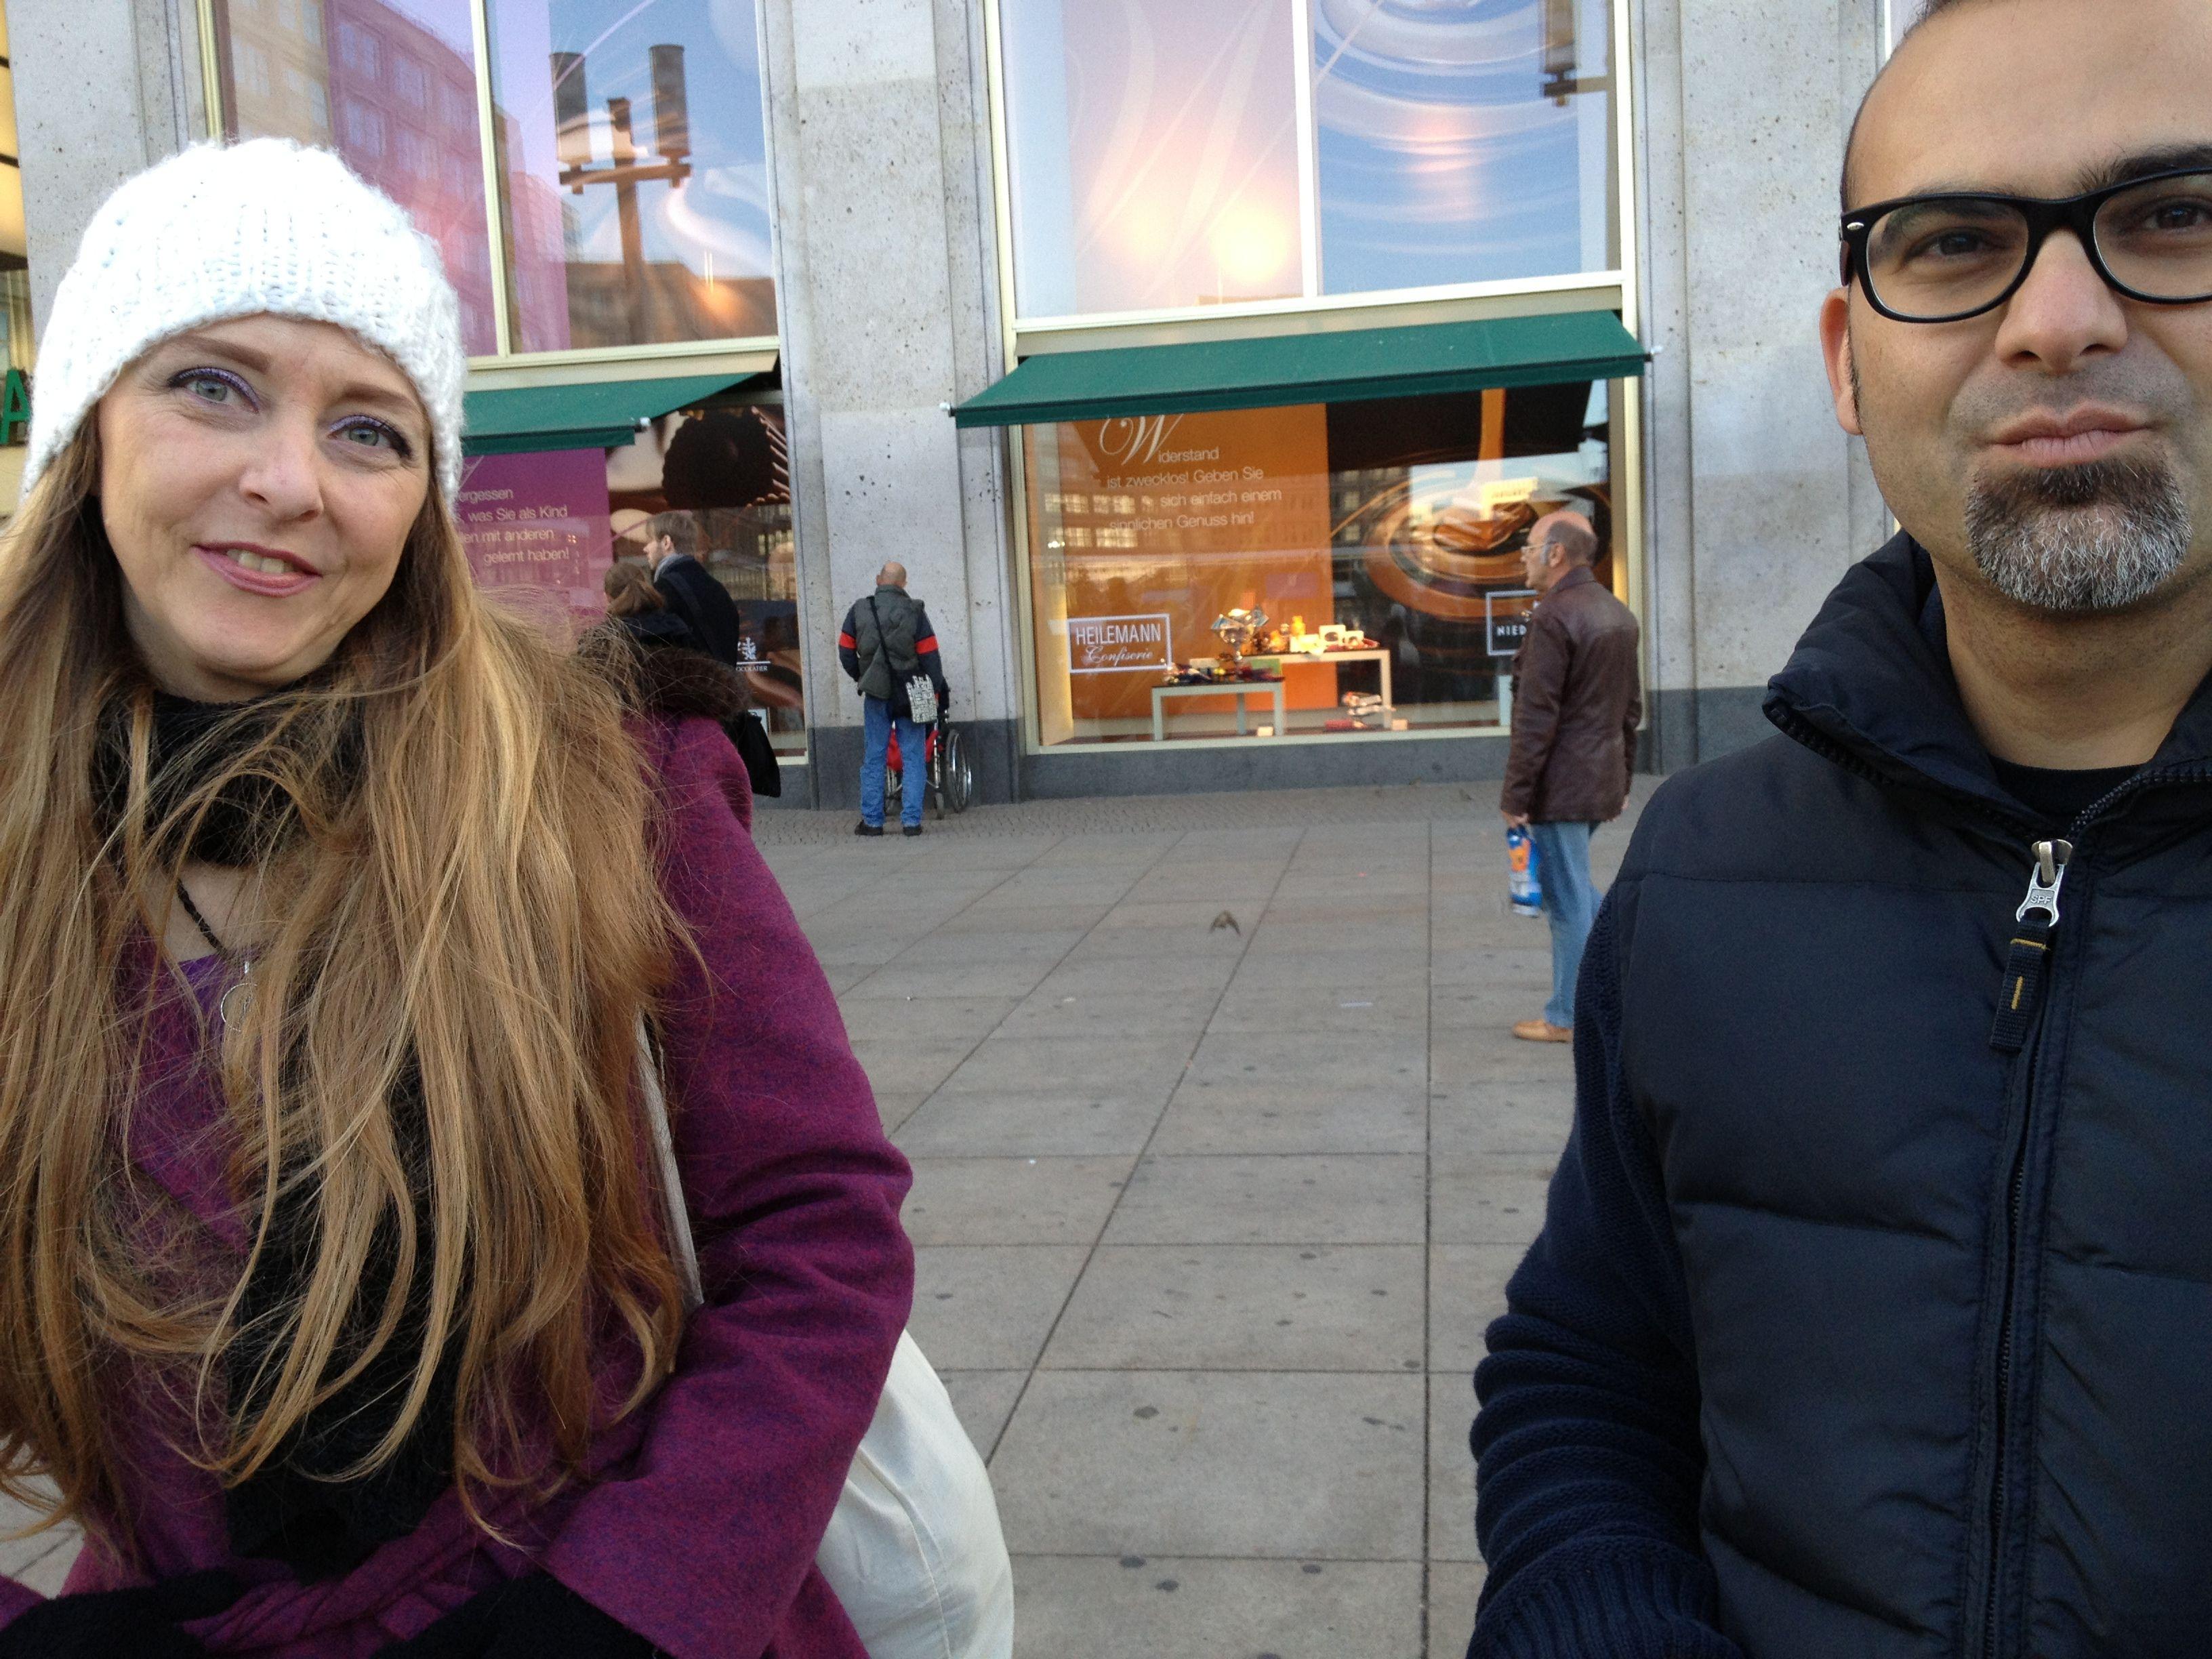 #ImprovFilmProject | #Berlin | actor Monique Amado (left) and director Xavier Agudo (right). Alexanderplatz.